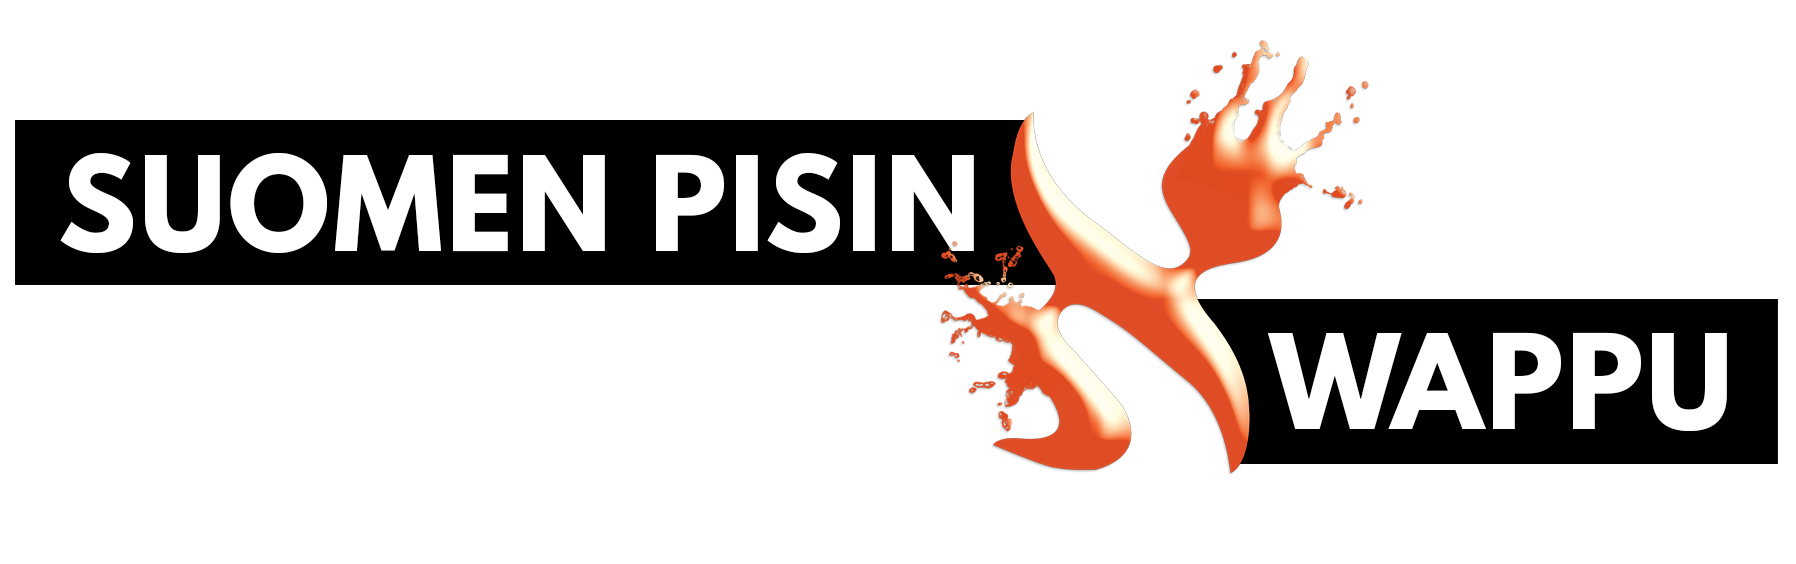 Suomen Pisin Wappu